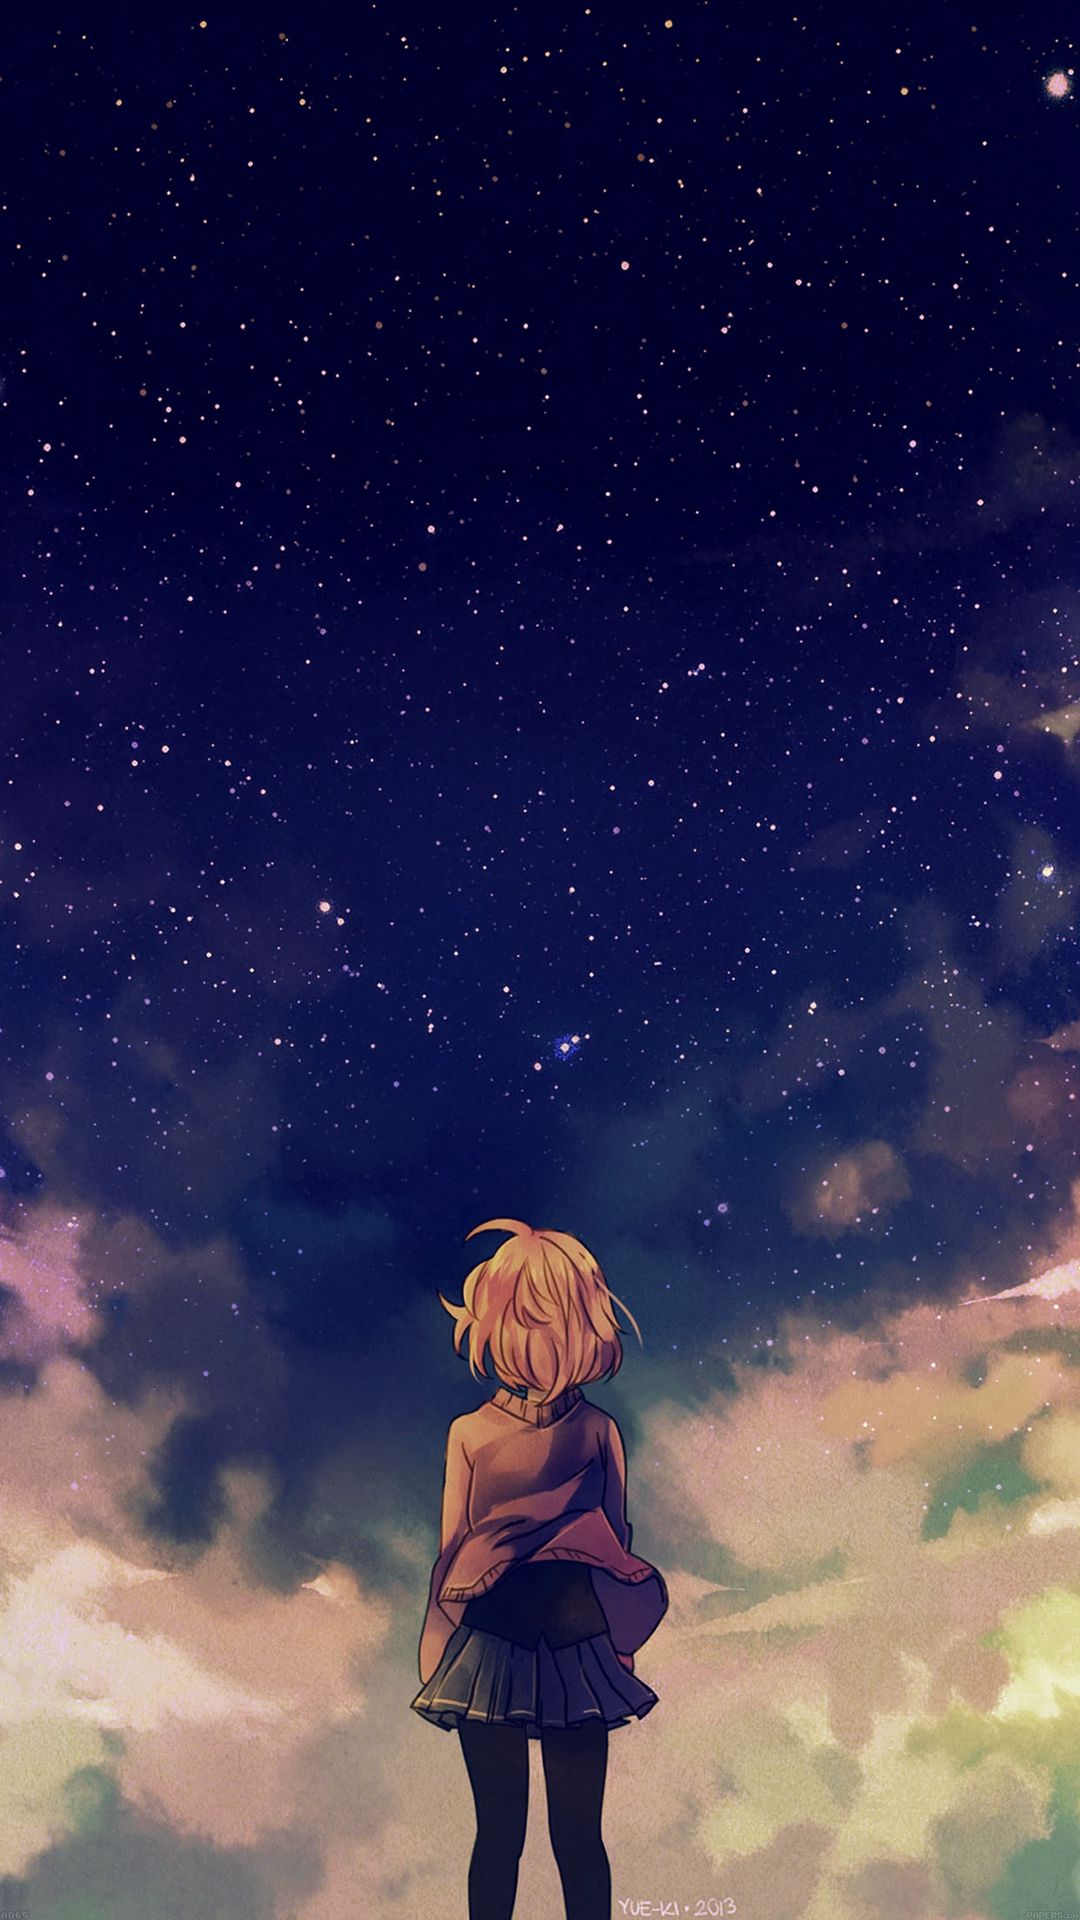 Starry space illust anime girl iphone 6 wallpaper